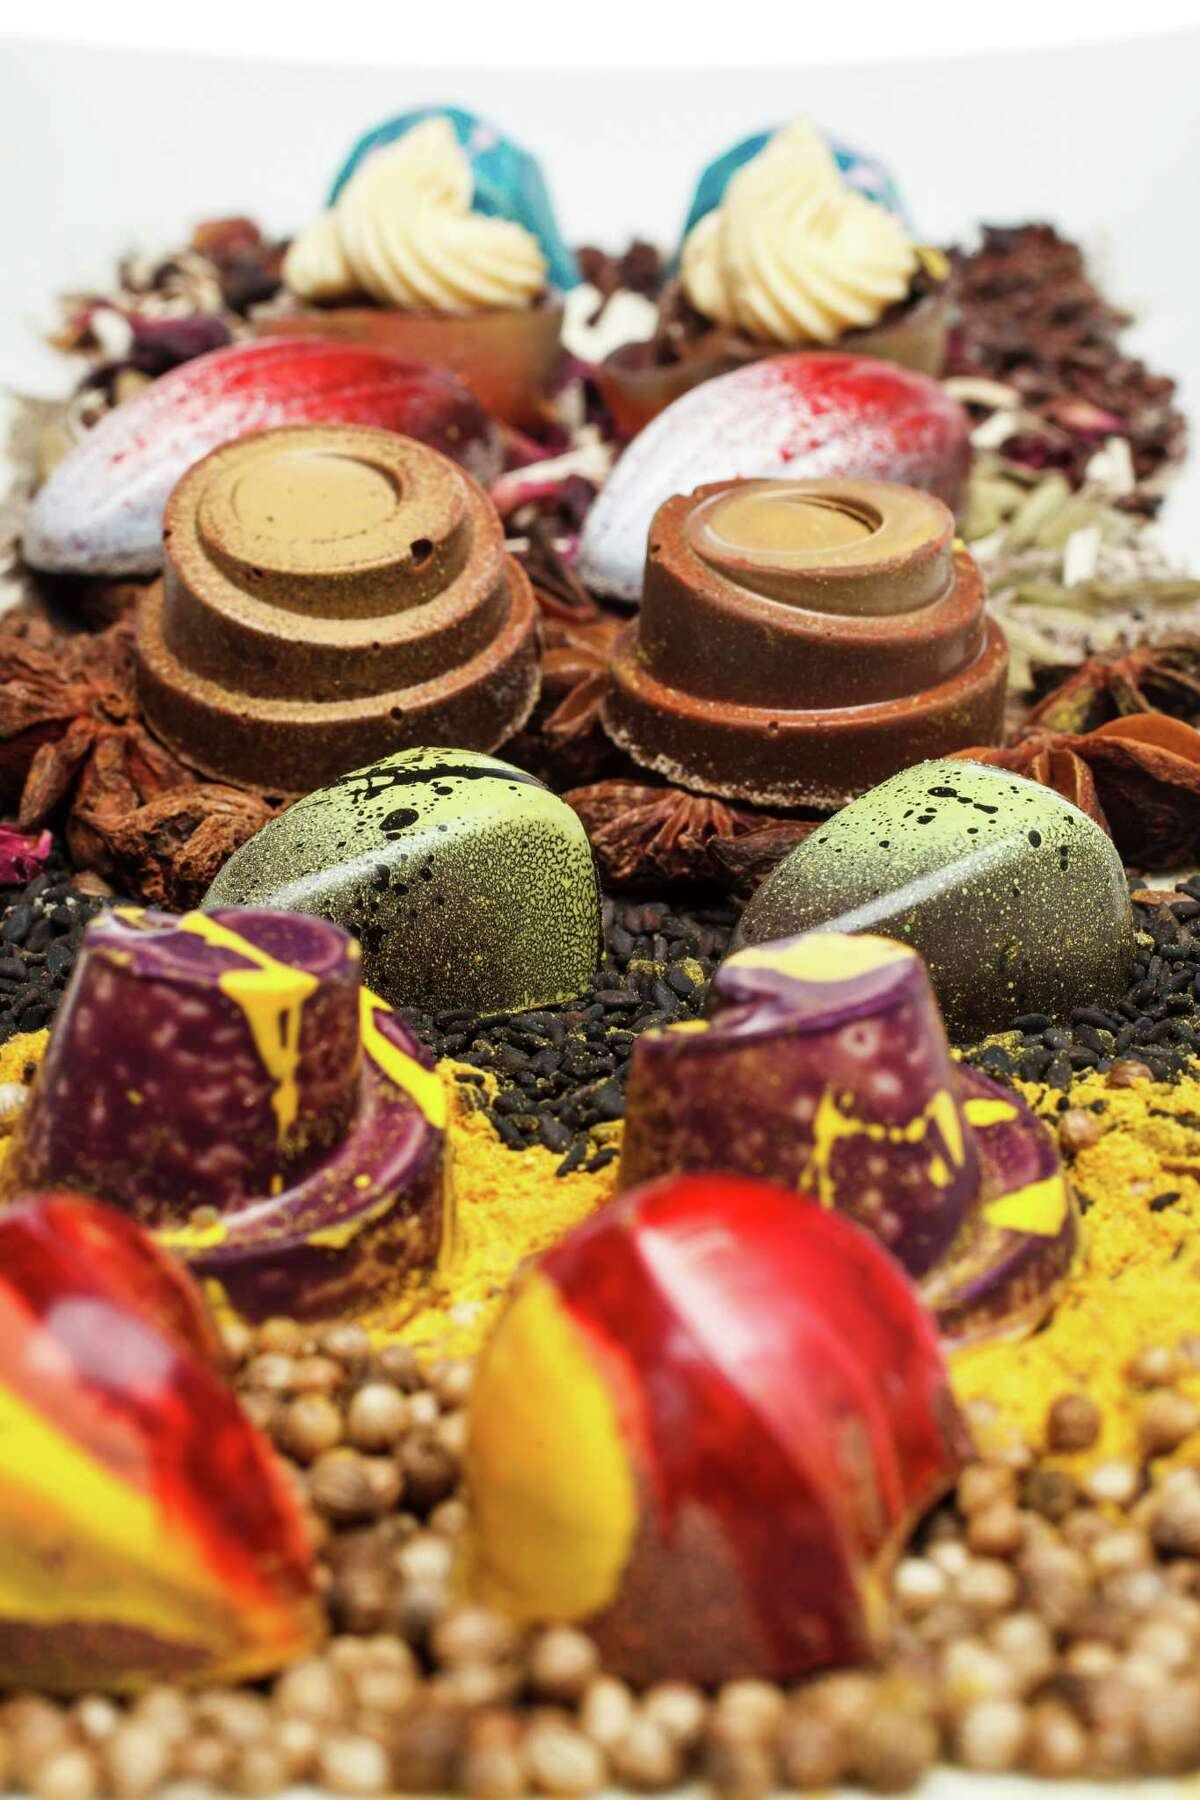 Cacao & Cardamom chocolates are available at cacaoandcardamom.com.